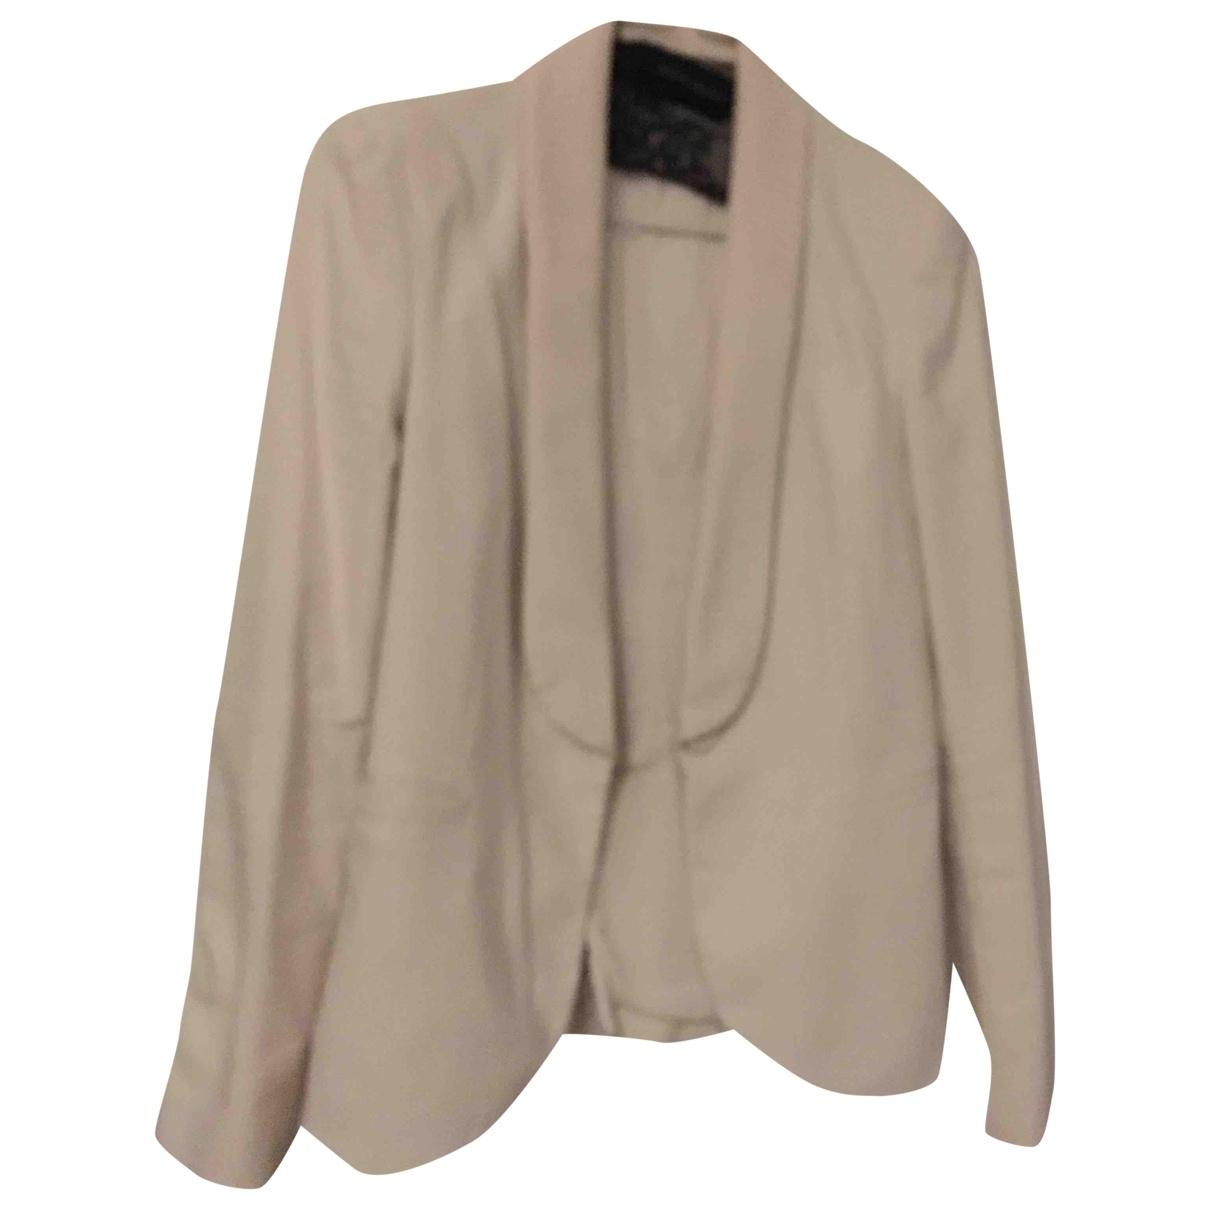 Zara \N White Cotton jacket for Women 34 FR